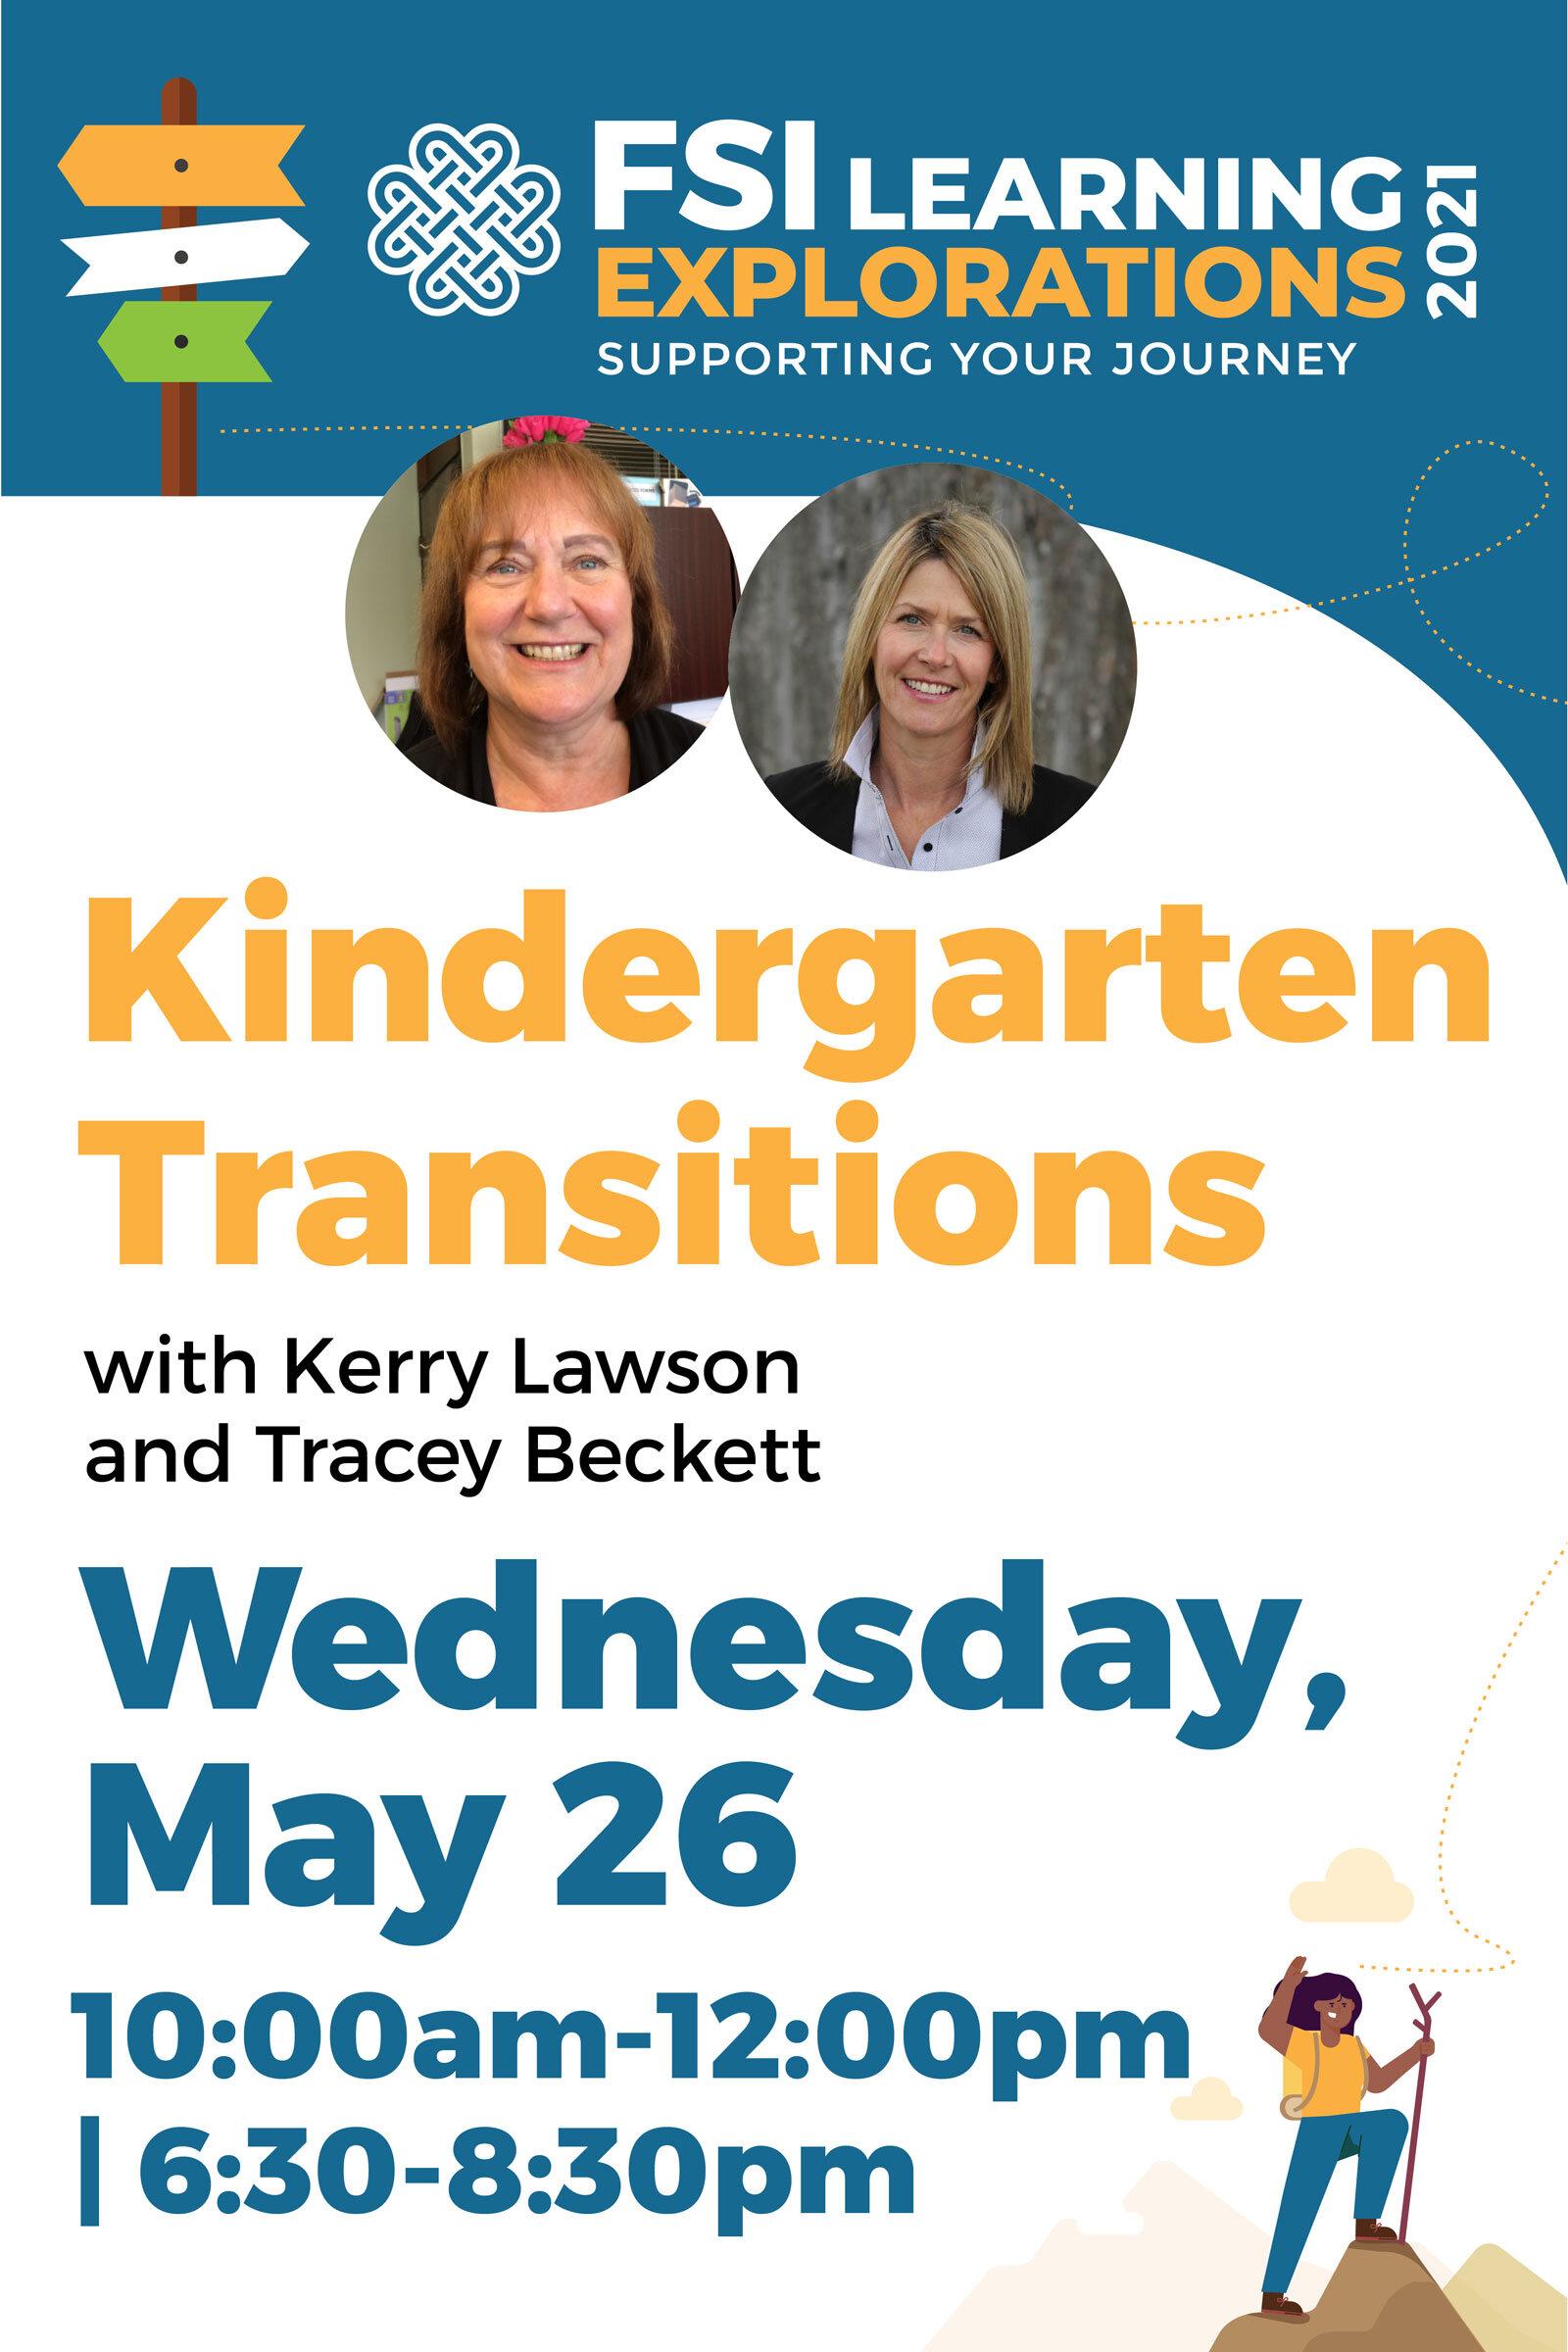 FSIBC Learning Explorations - Kindergarten Transitions